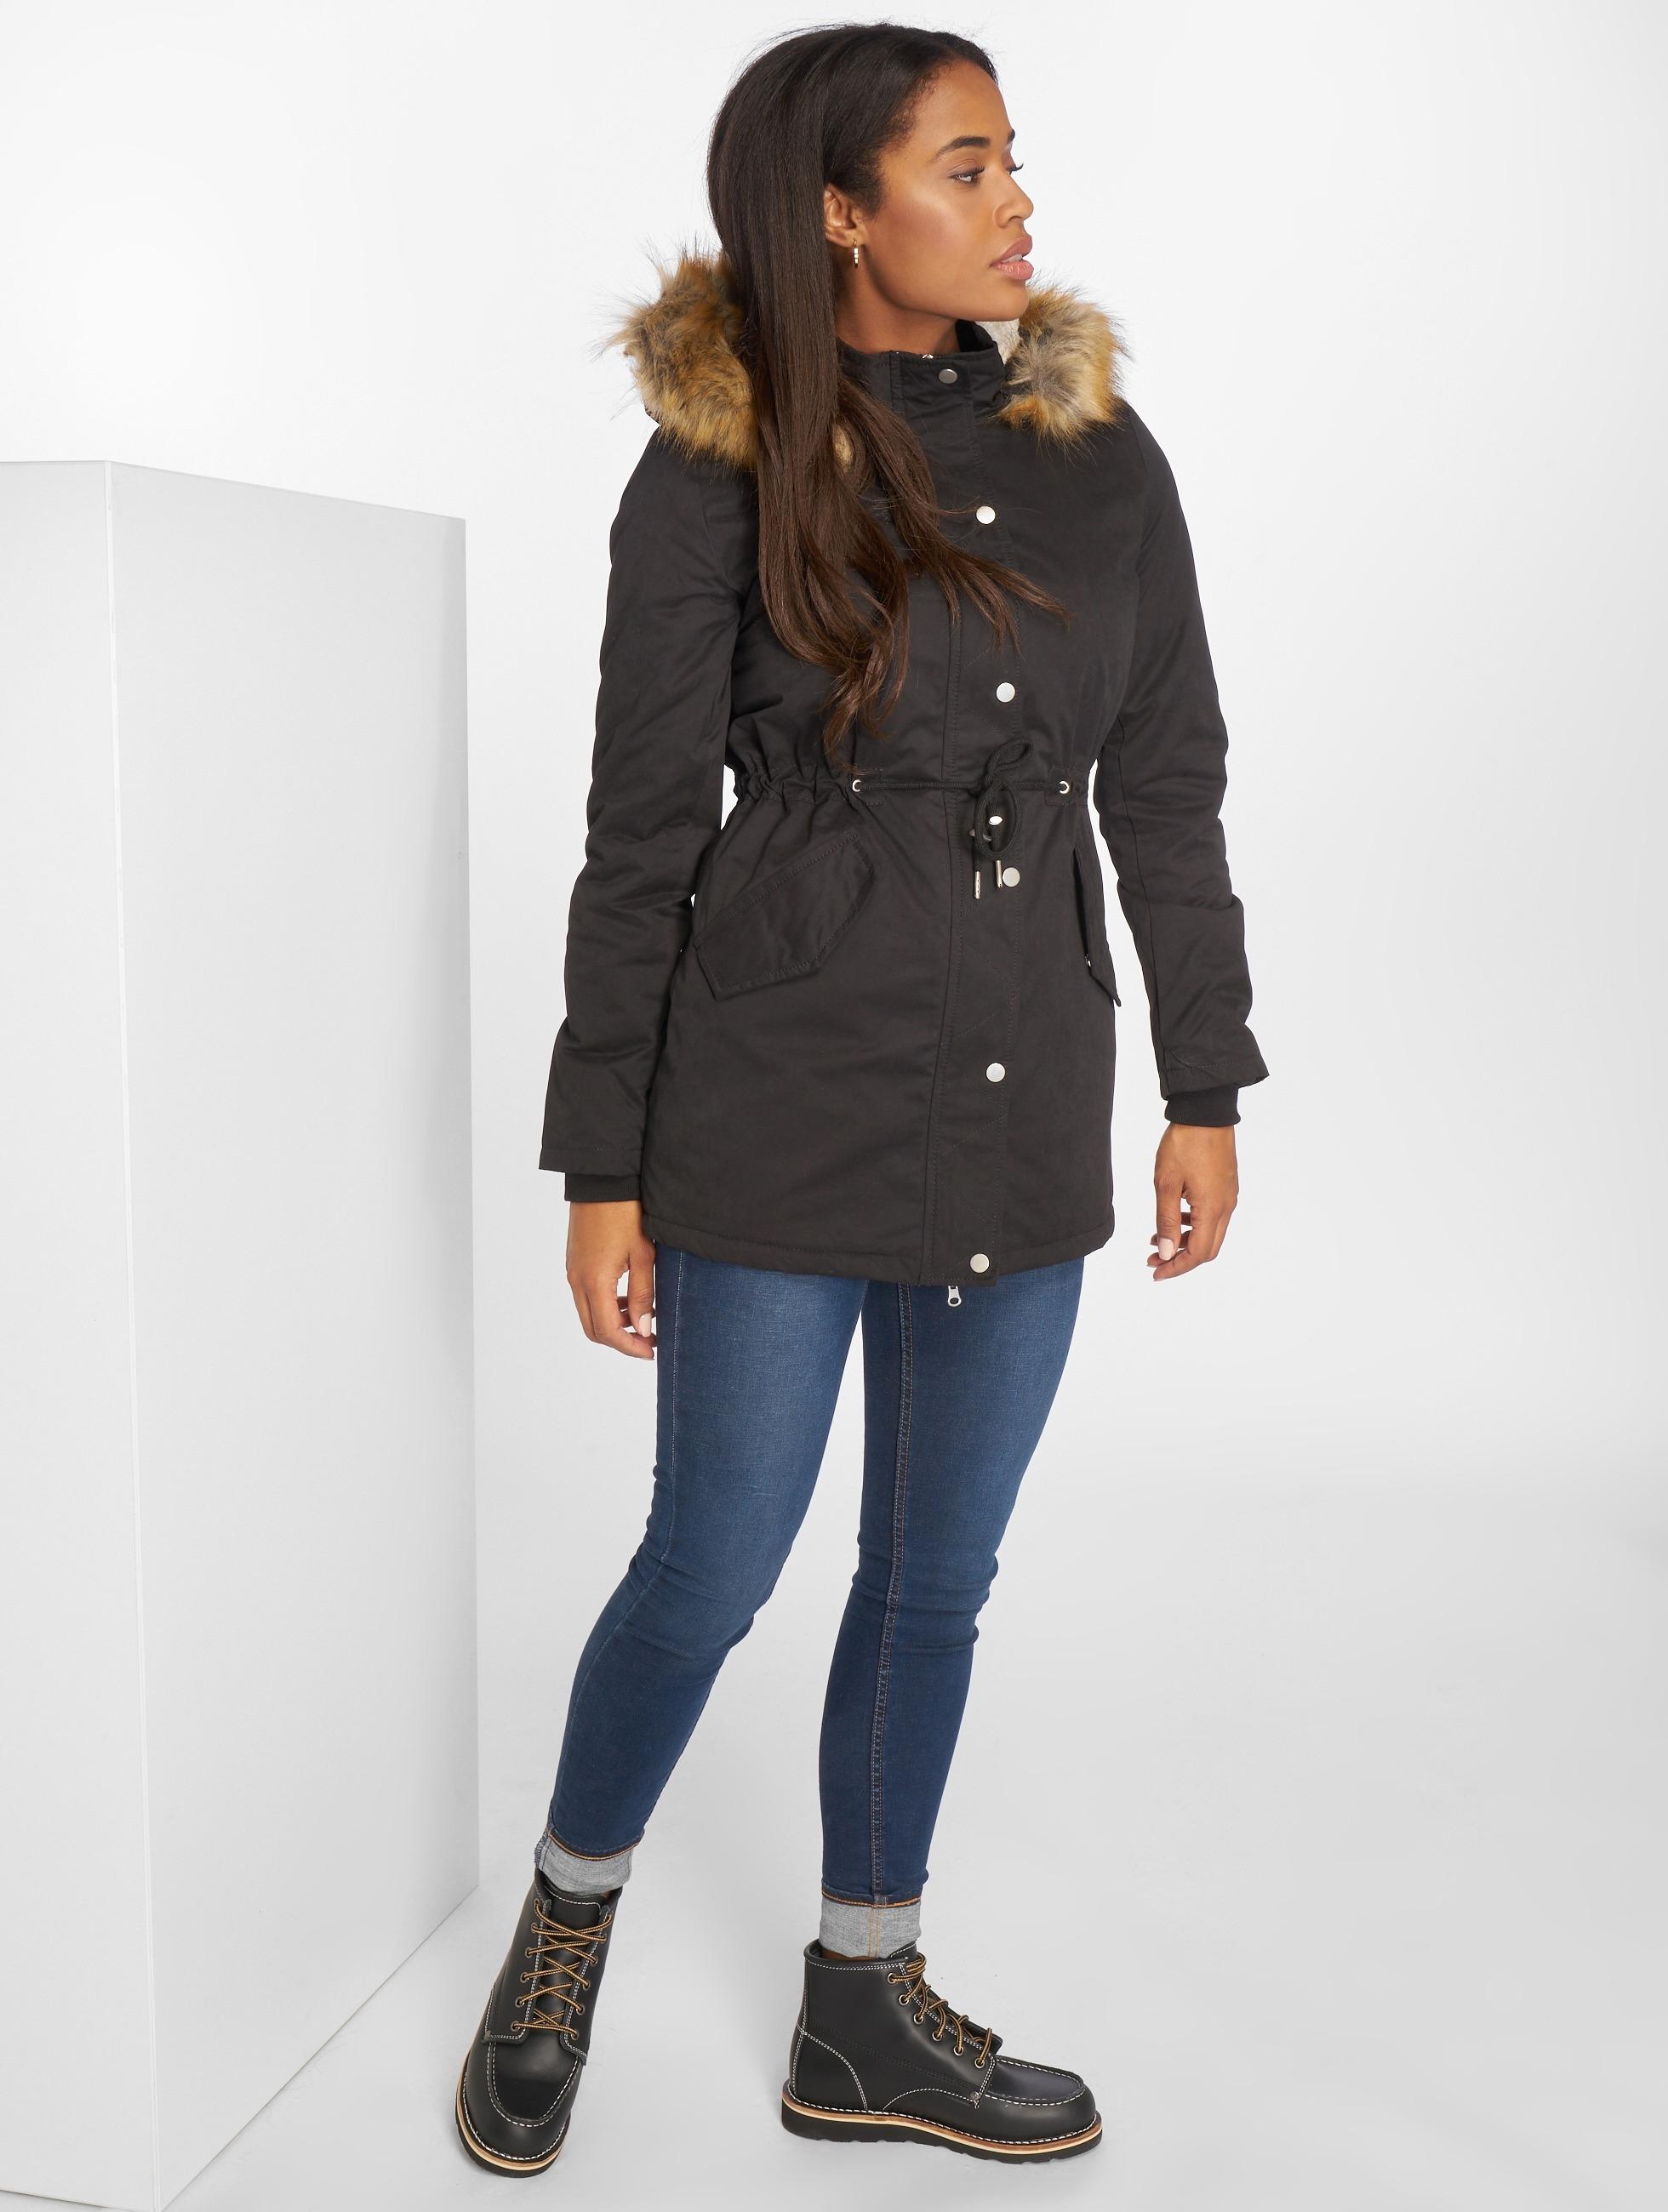 Urban Classics Winterjacke Ladies Sherpa Lined Peached schwarz